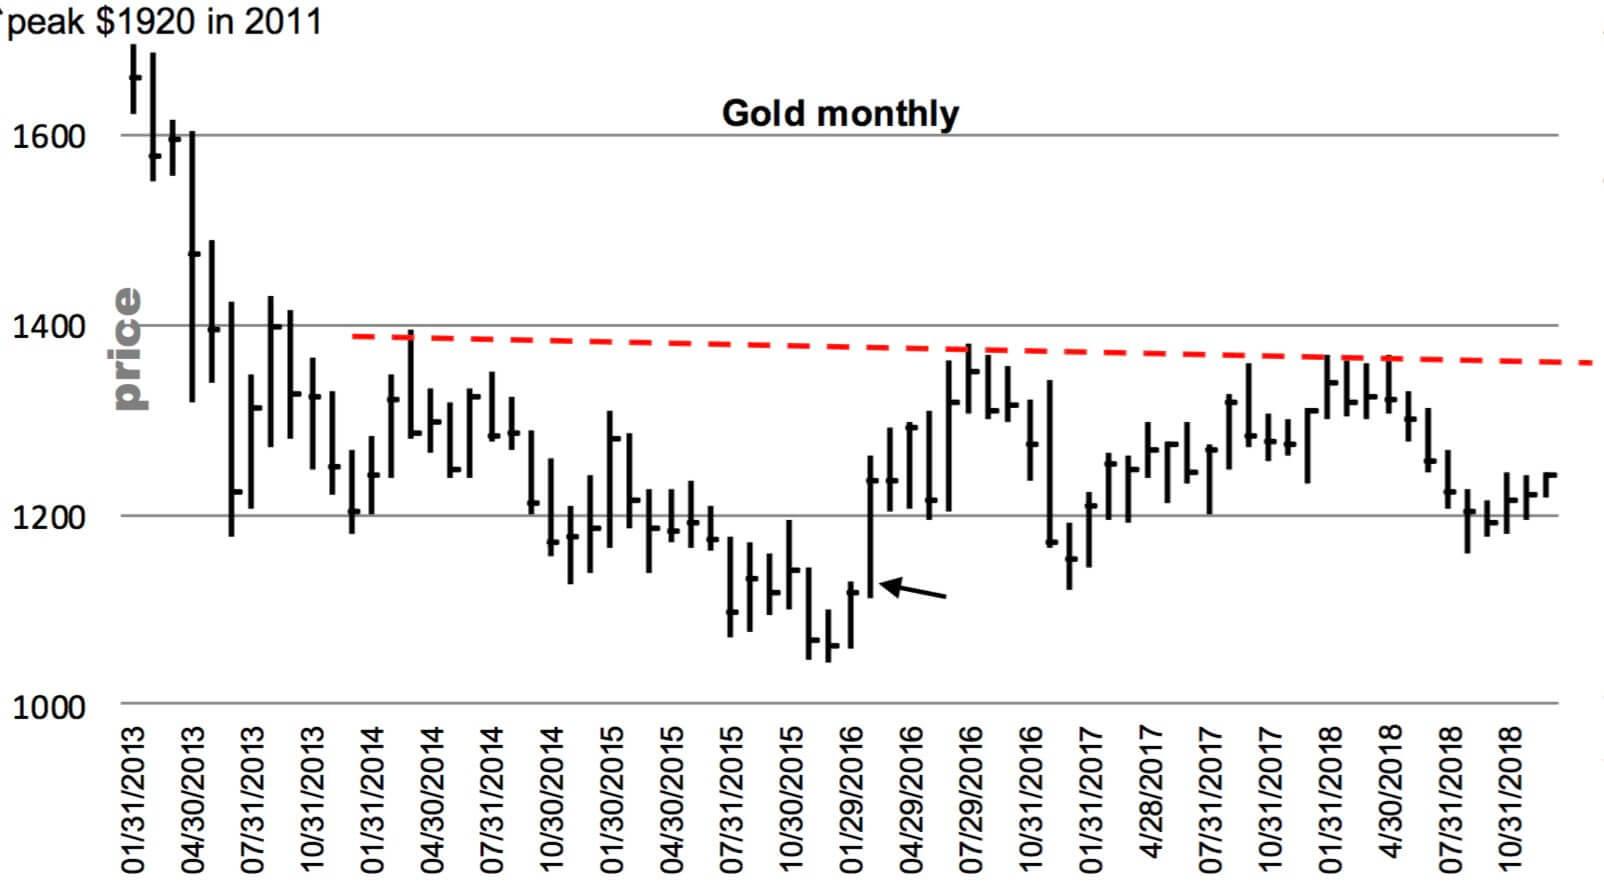 Gold Price, Monthly Jan 2013 - Nov 2018